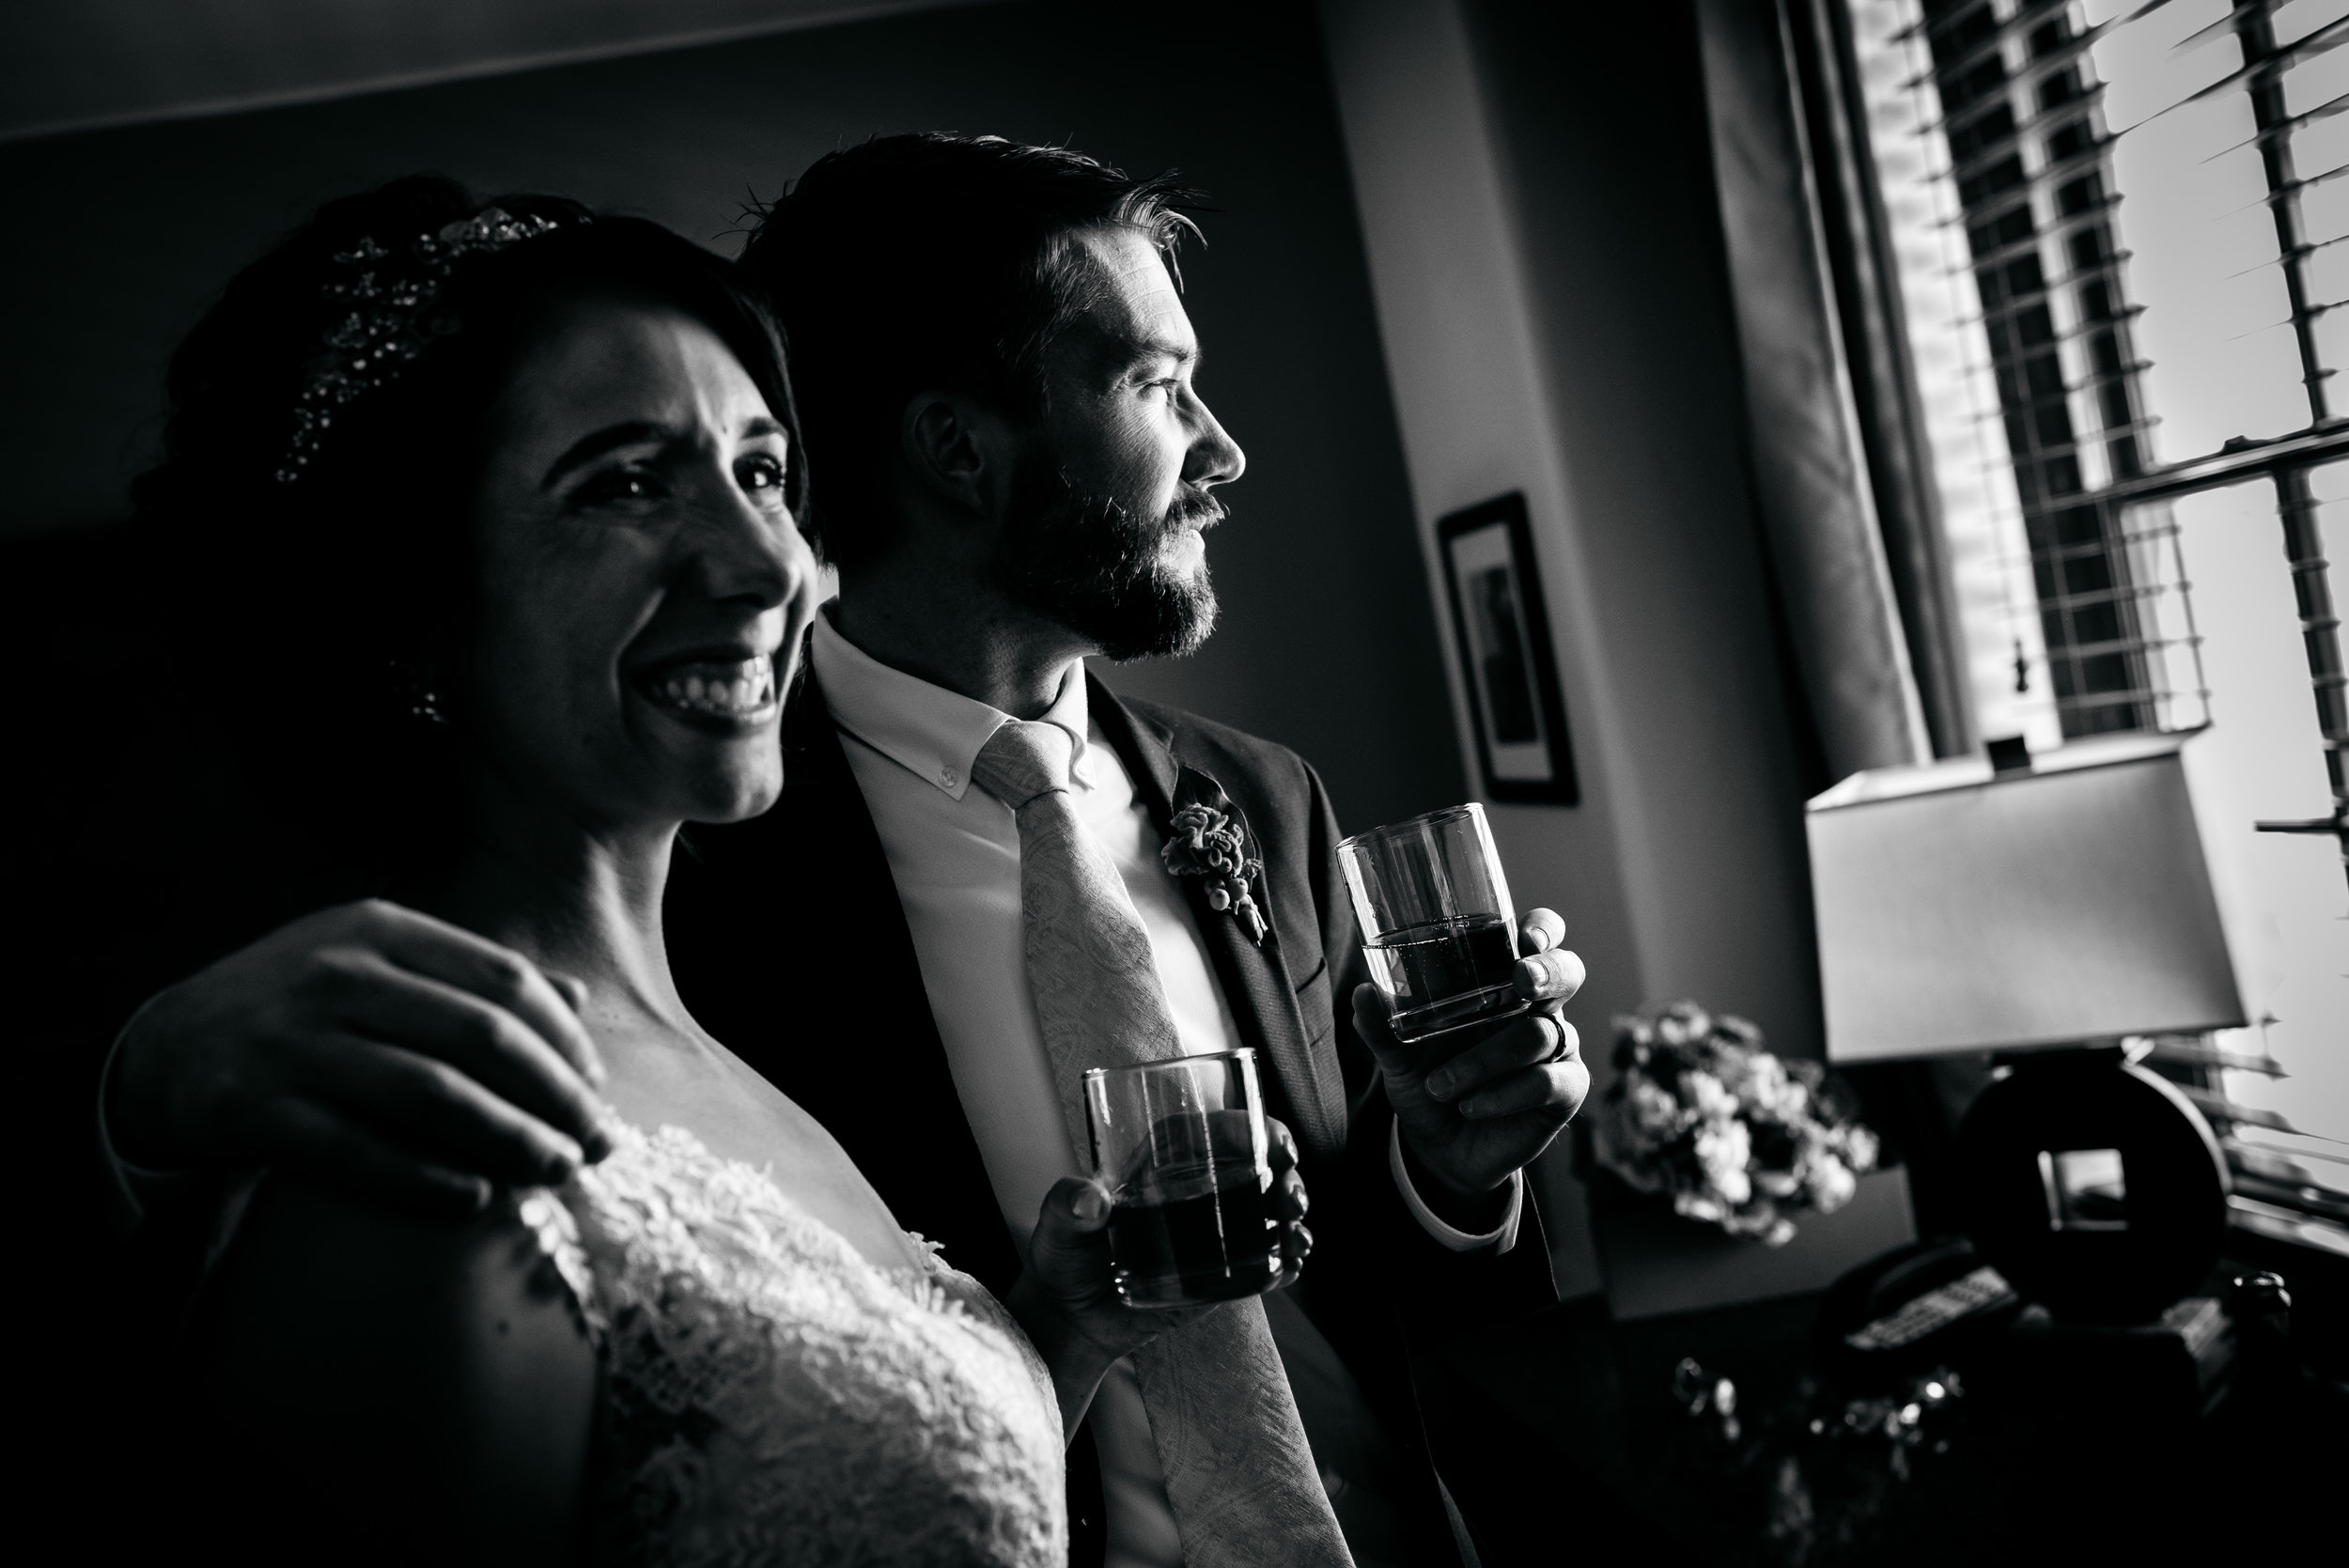 Extended_Play_Photography_Carmella_Wedding-14.jpg